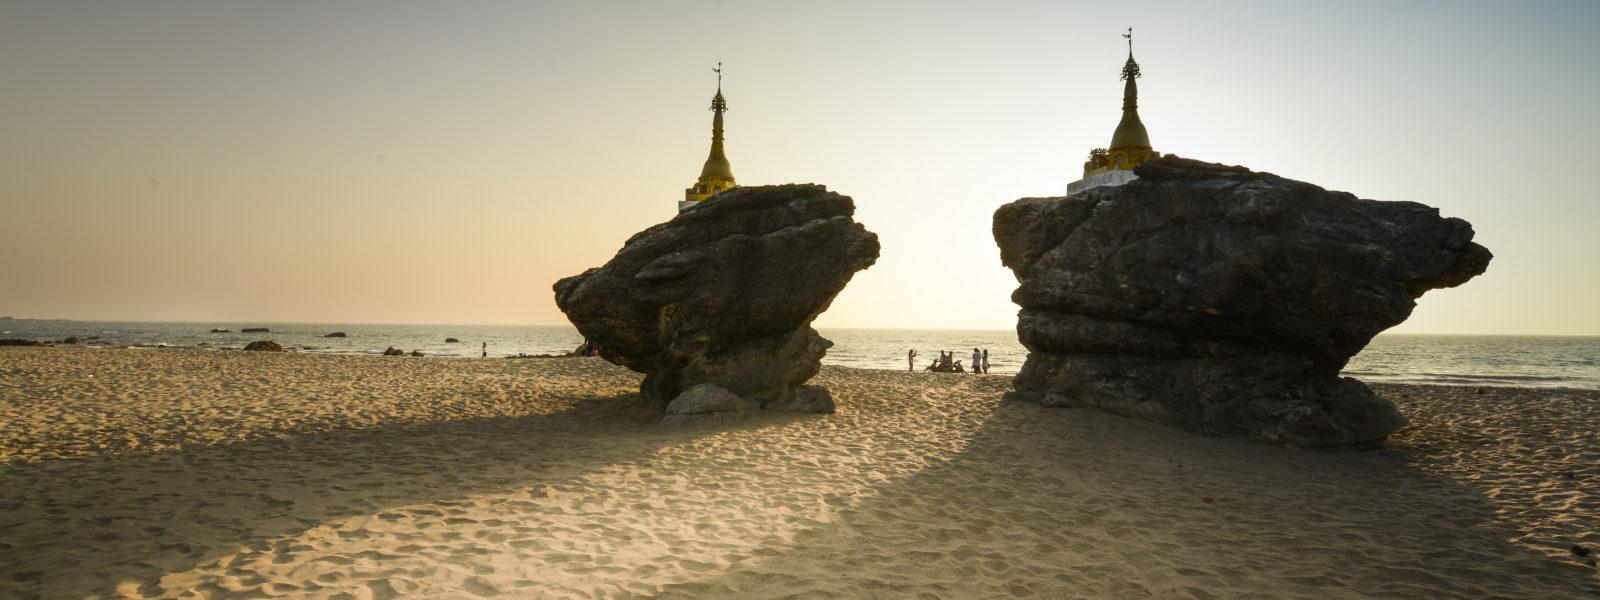 Ngwe Saung Beach - Twin Pagodas on Beach - Myanmar - Ko Thet